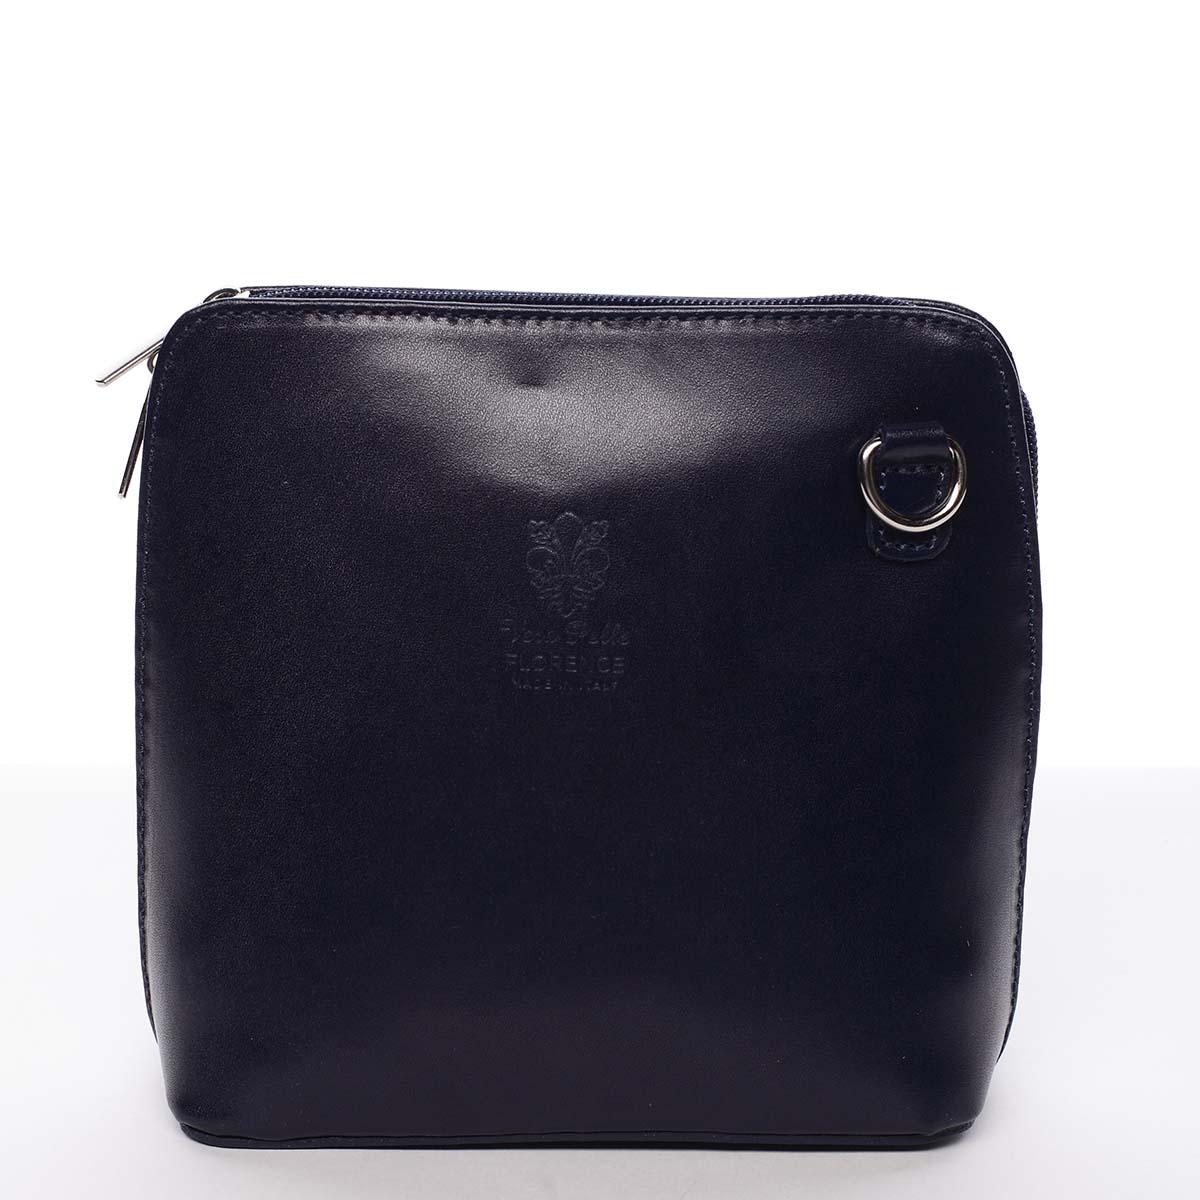 Dámska kožená crossbody kabelka tmavomodrá - ItalY Hannah